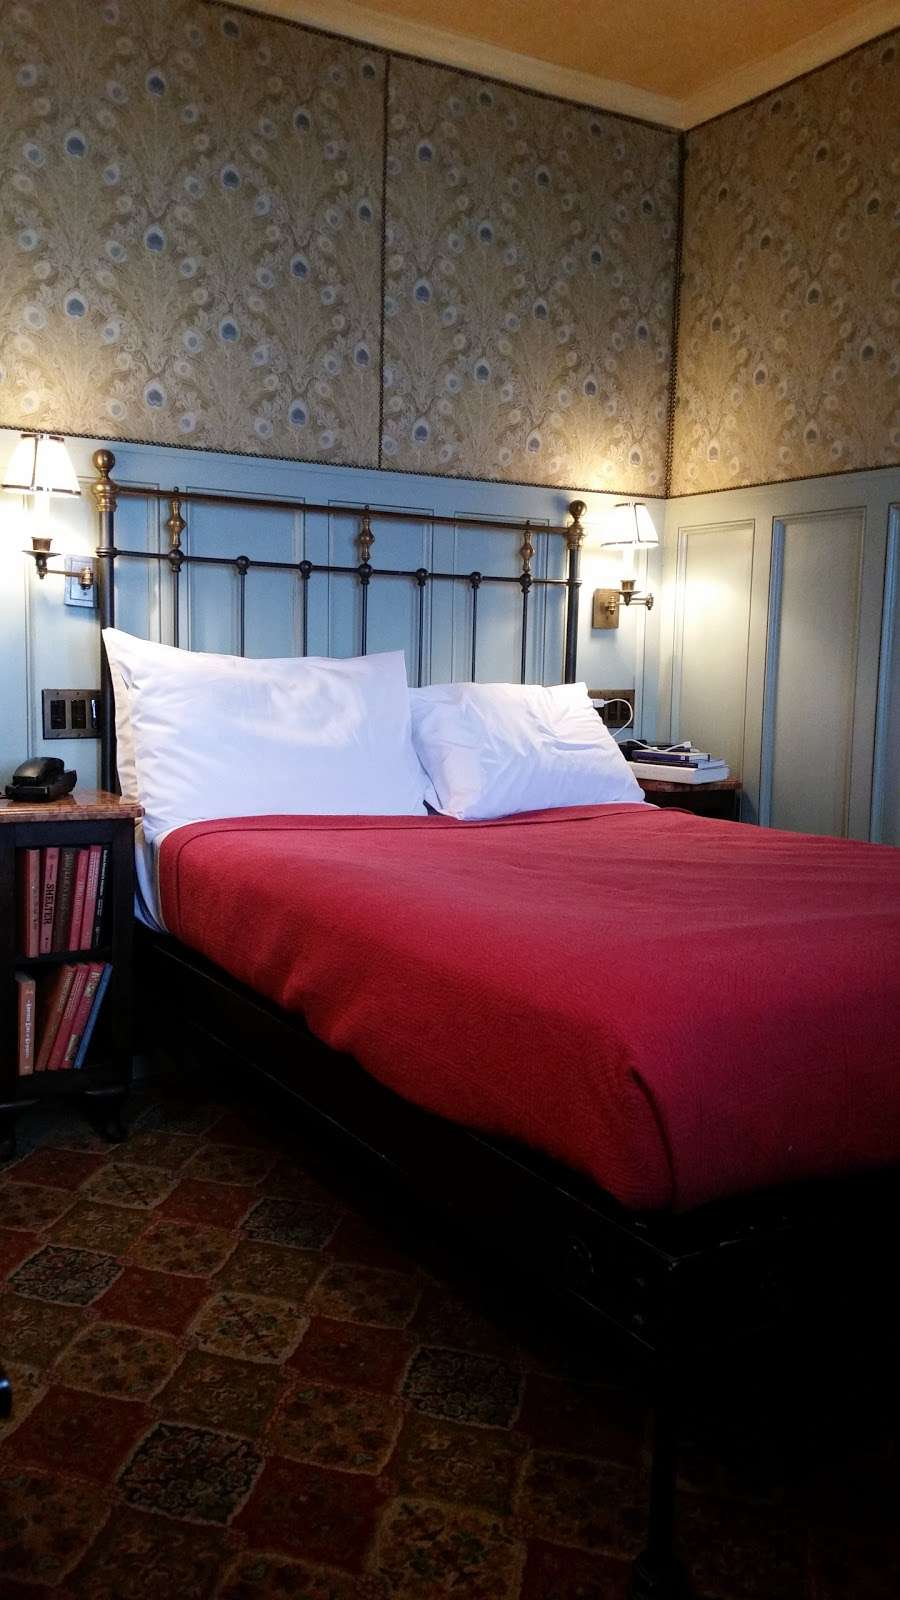 Jane Hotel - lodging  | Photo 10 of 10 | Address: 113 Jane St, New York, NY 10014, USA | Phone: (212) 924-6700